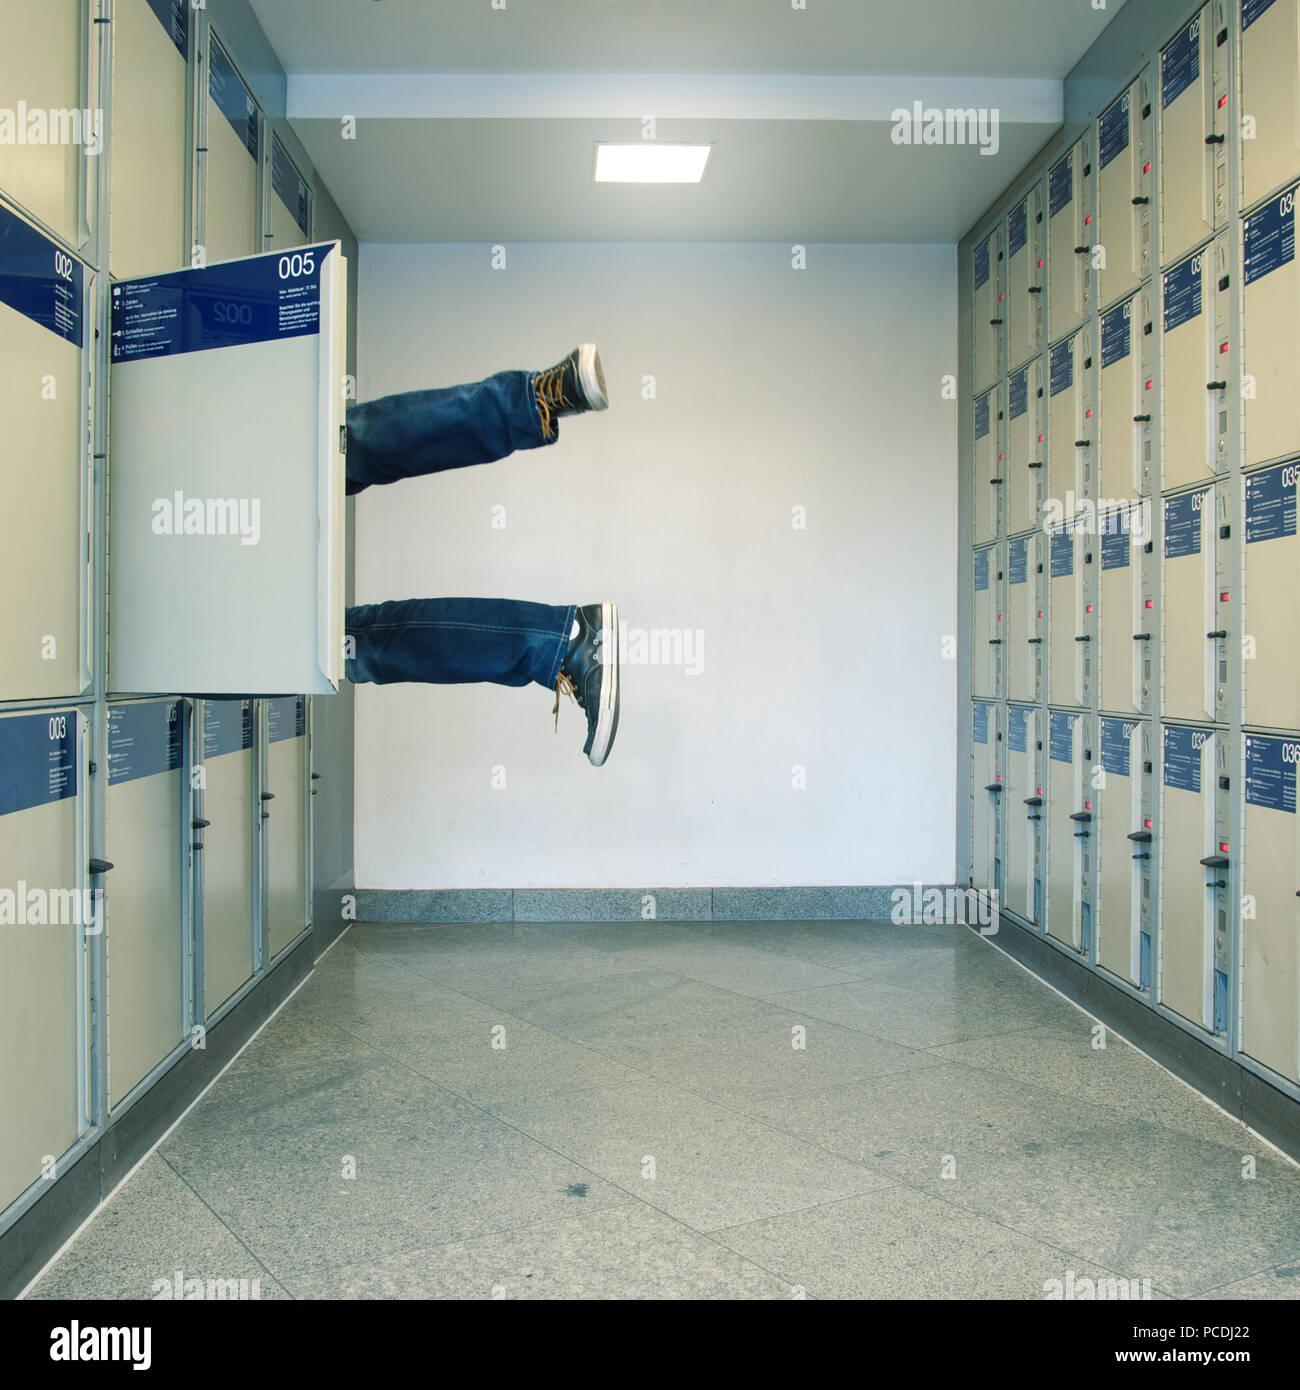 humor,bizarre,leg,lockers,stow - Stock Image